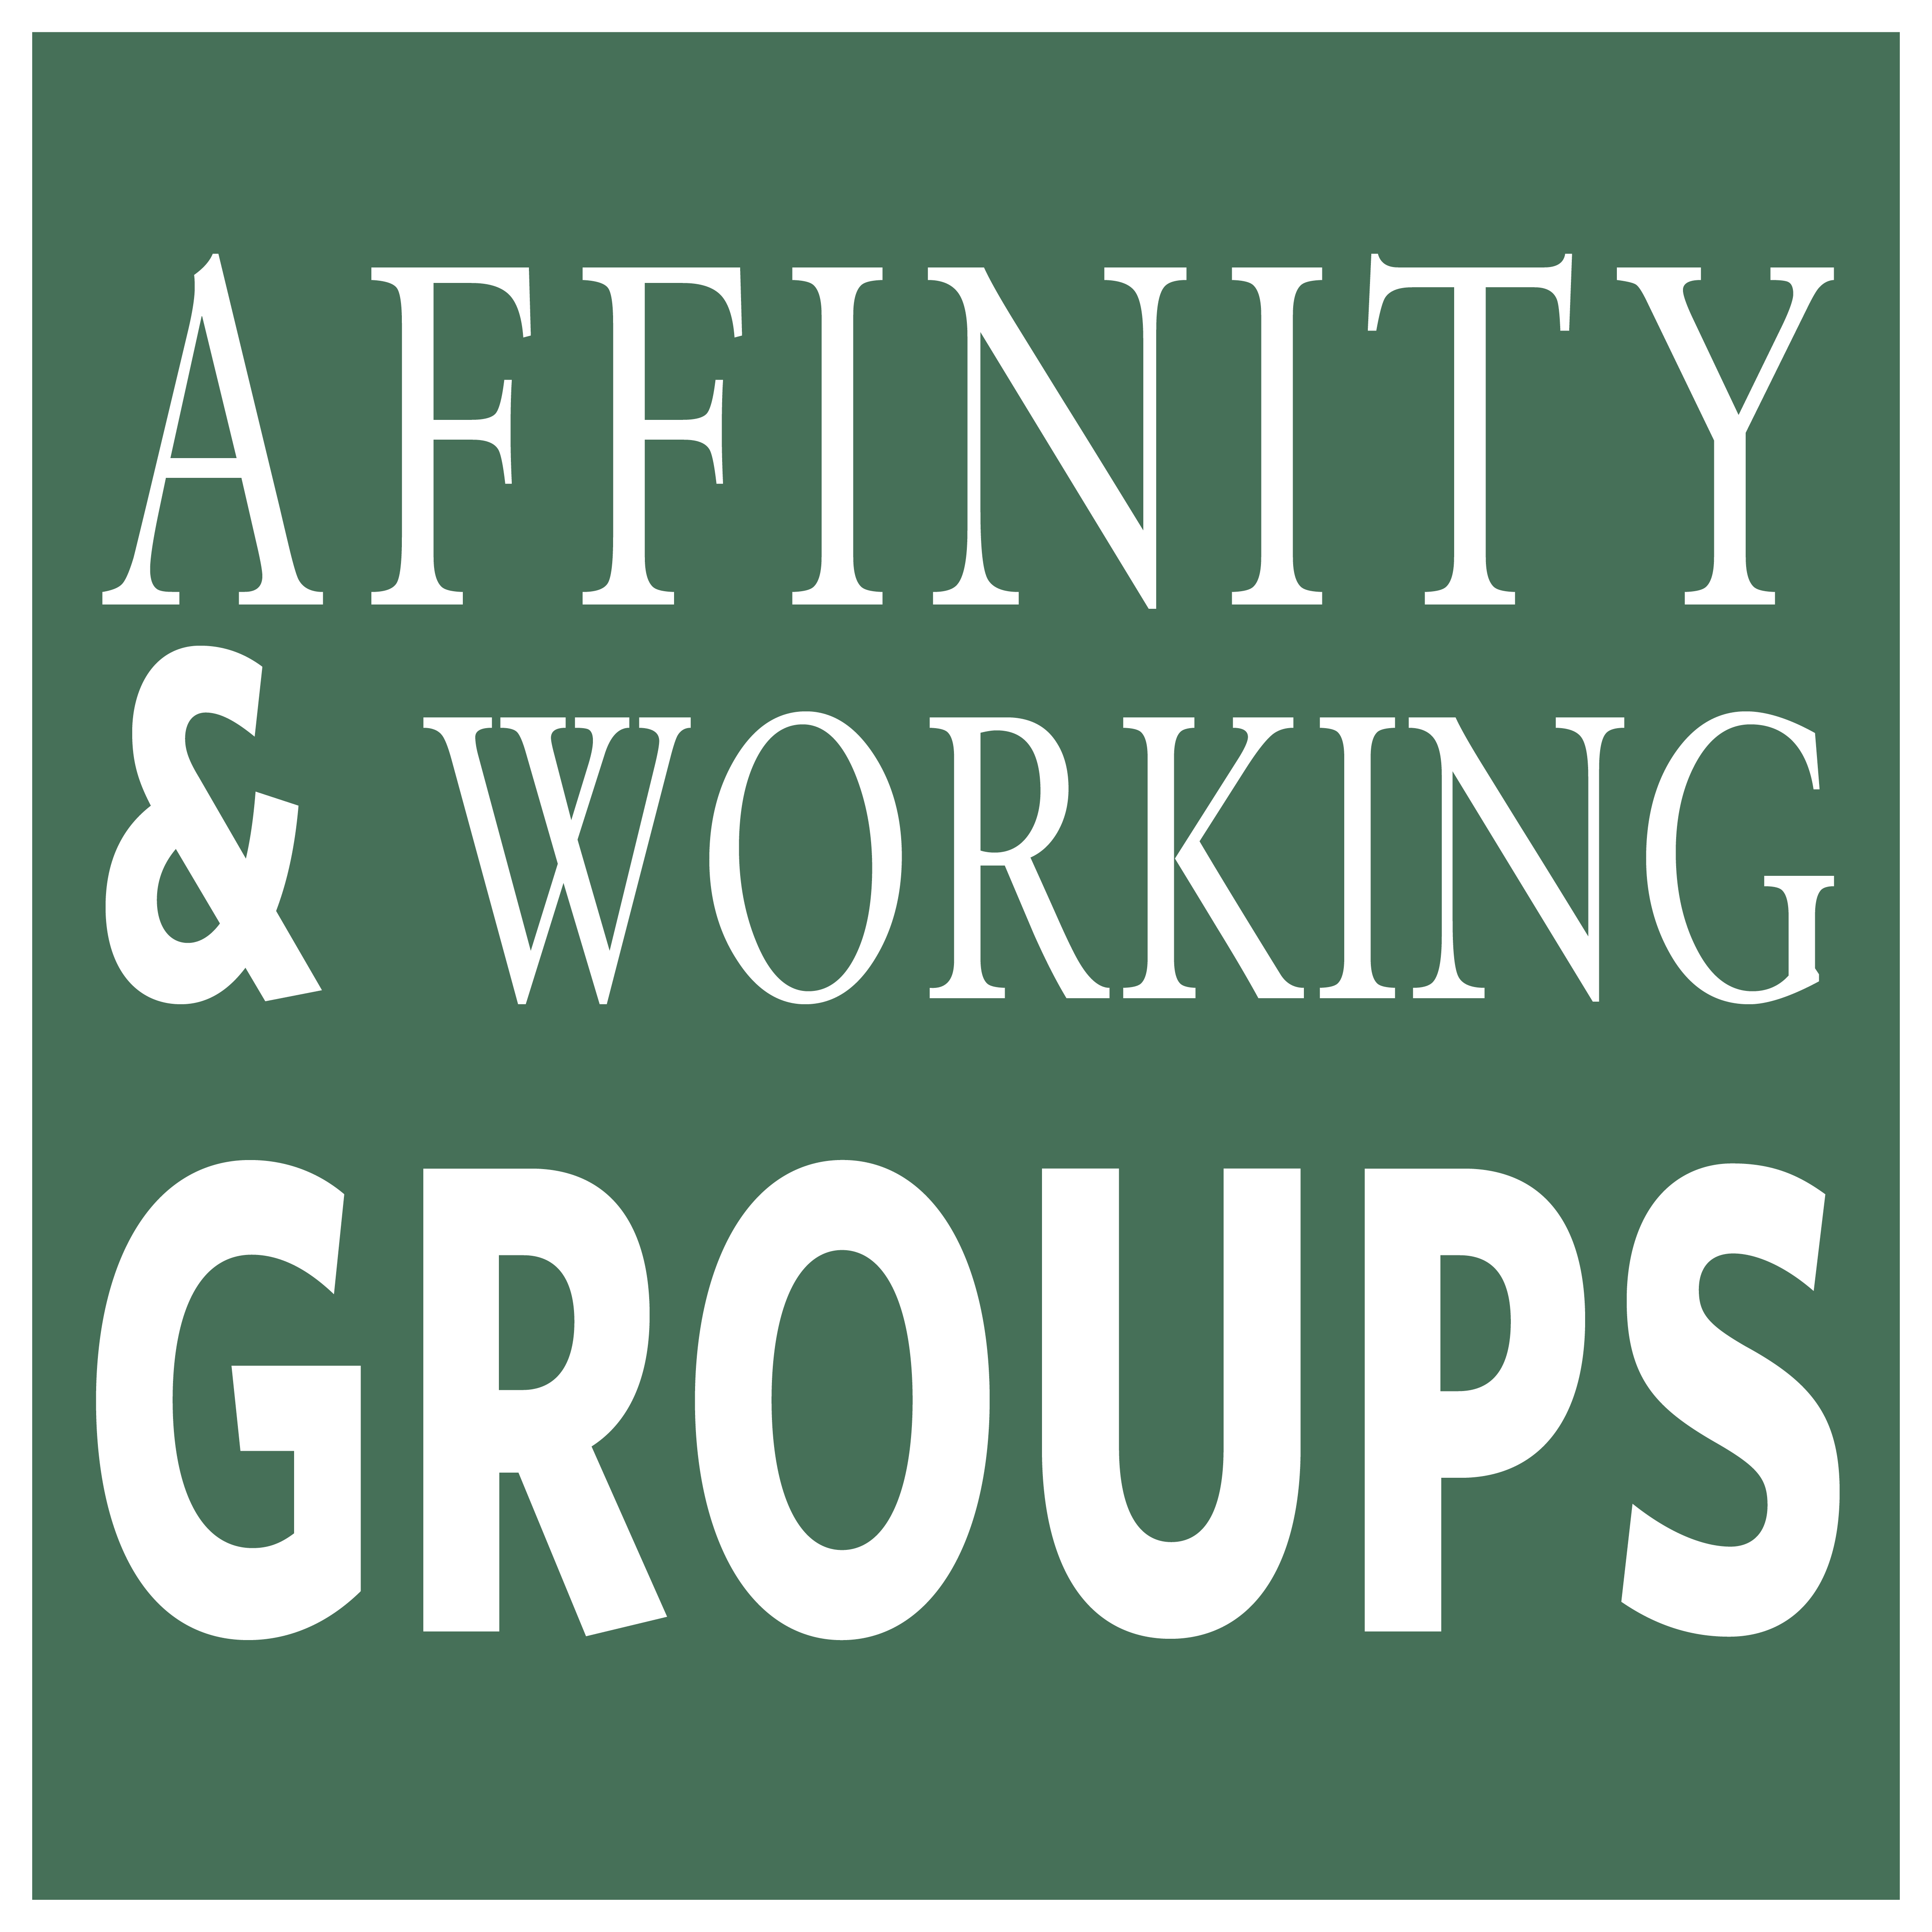 Copy-of-Affinity-Groups-v2.png